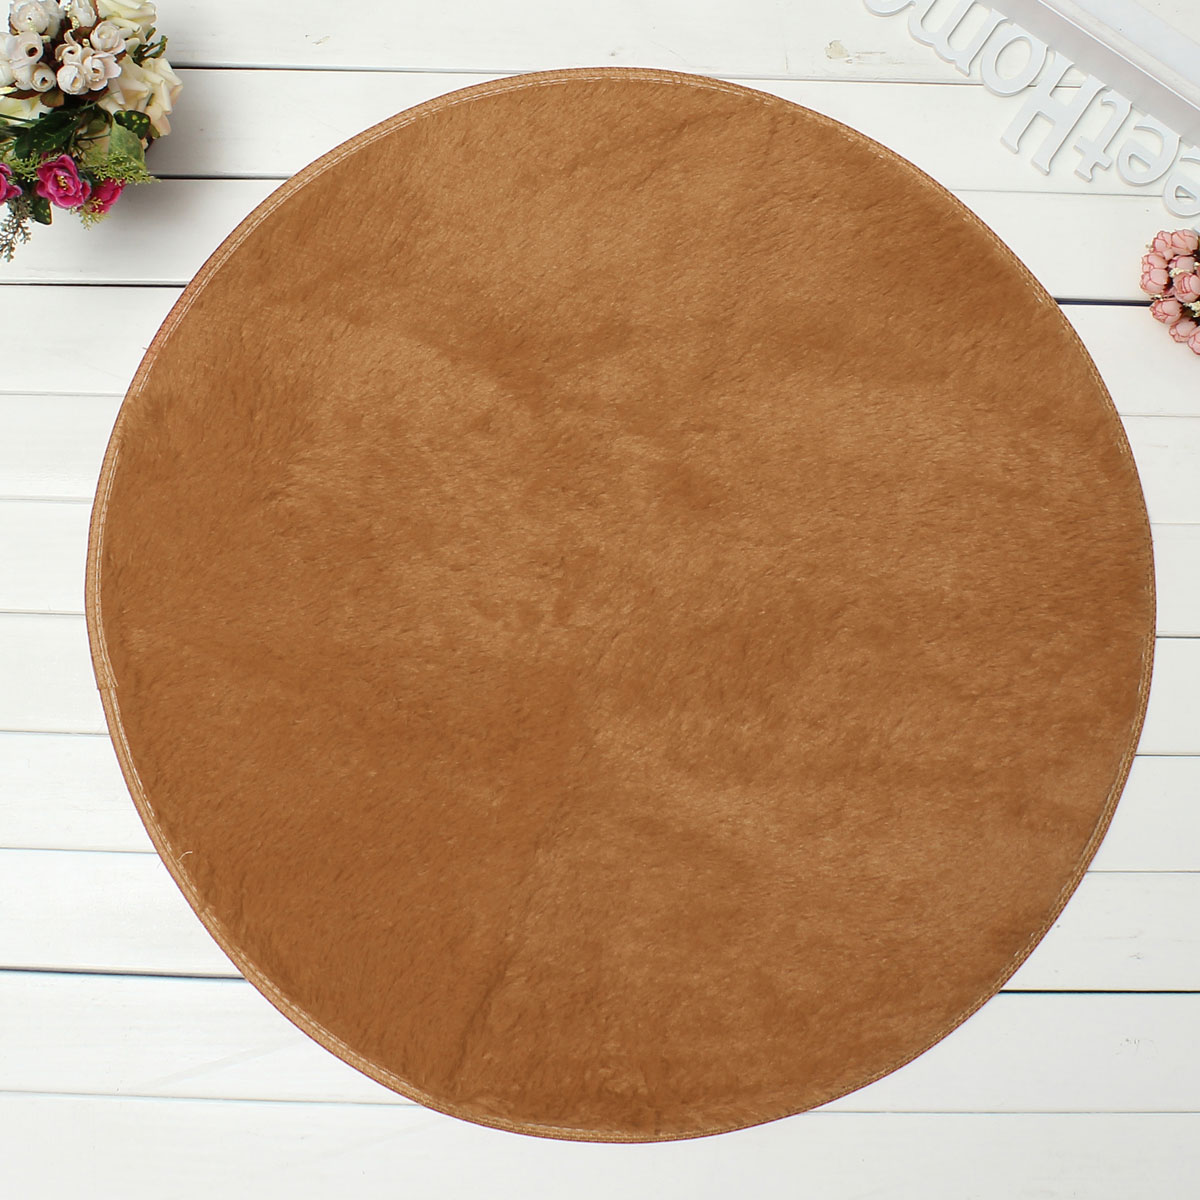 40 60 82cm badematte badvorleger badteppich badgarnitur t rmatte bodematte rund ebay. Black Bedroom Furniture Sets. Home Design Ideas